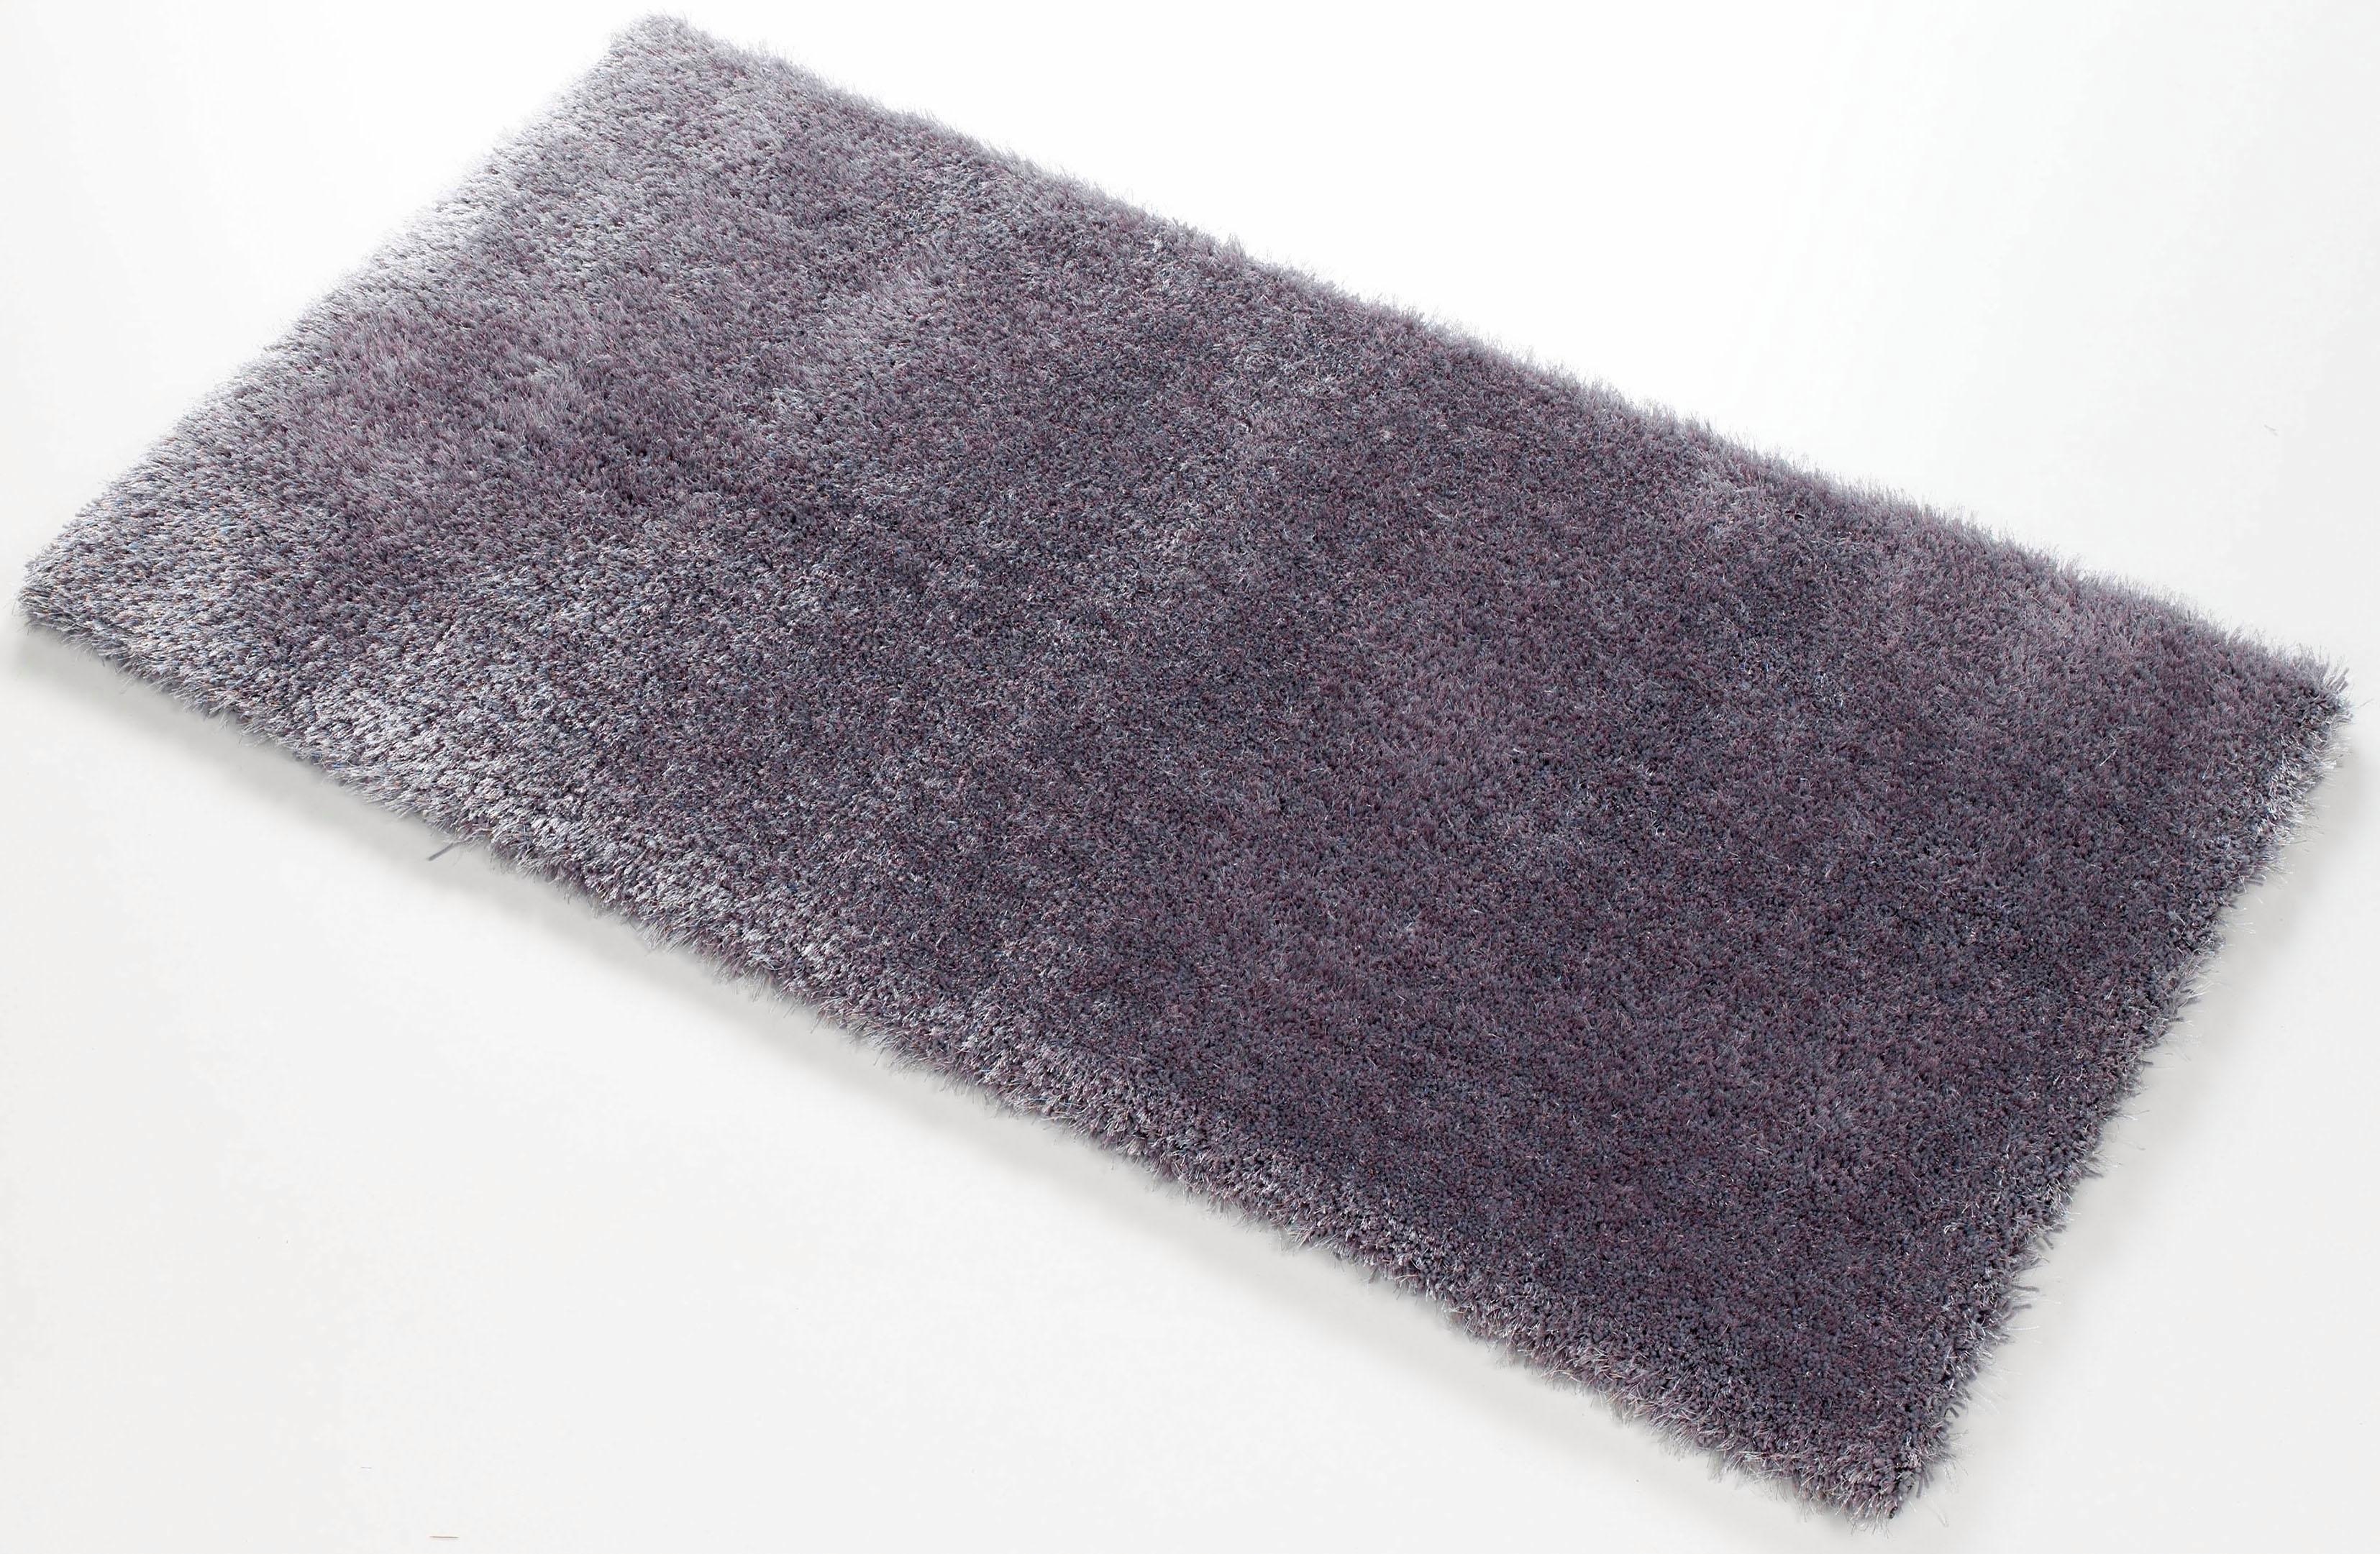 KiYou Shaggy Hoogpolig vloerkleed, »KiYou Shaggy«, rechthoekig, hoogte 40 mm voordelig en veilig online kopen